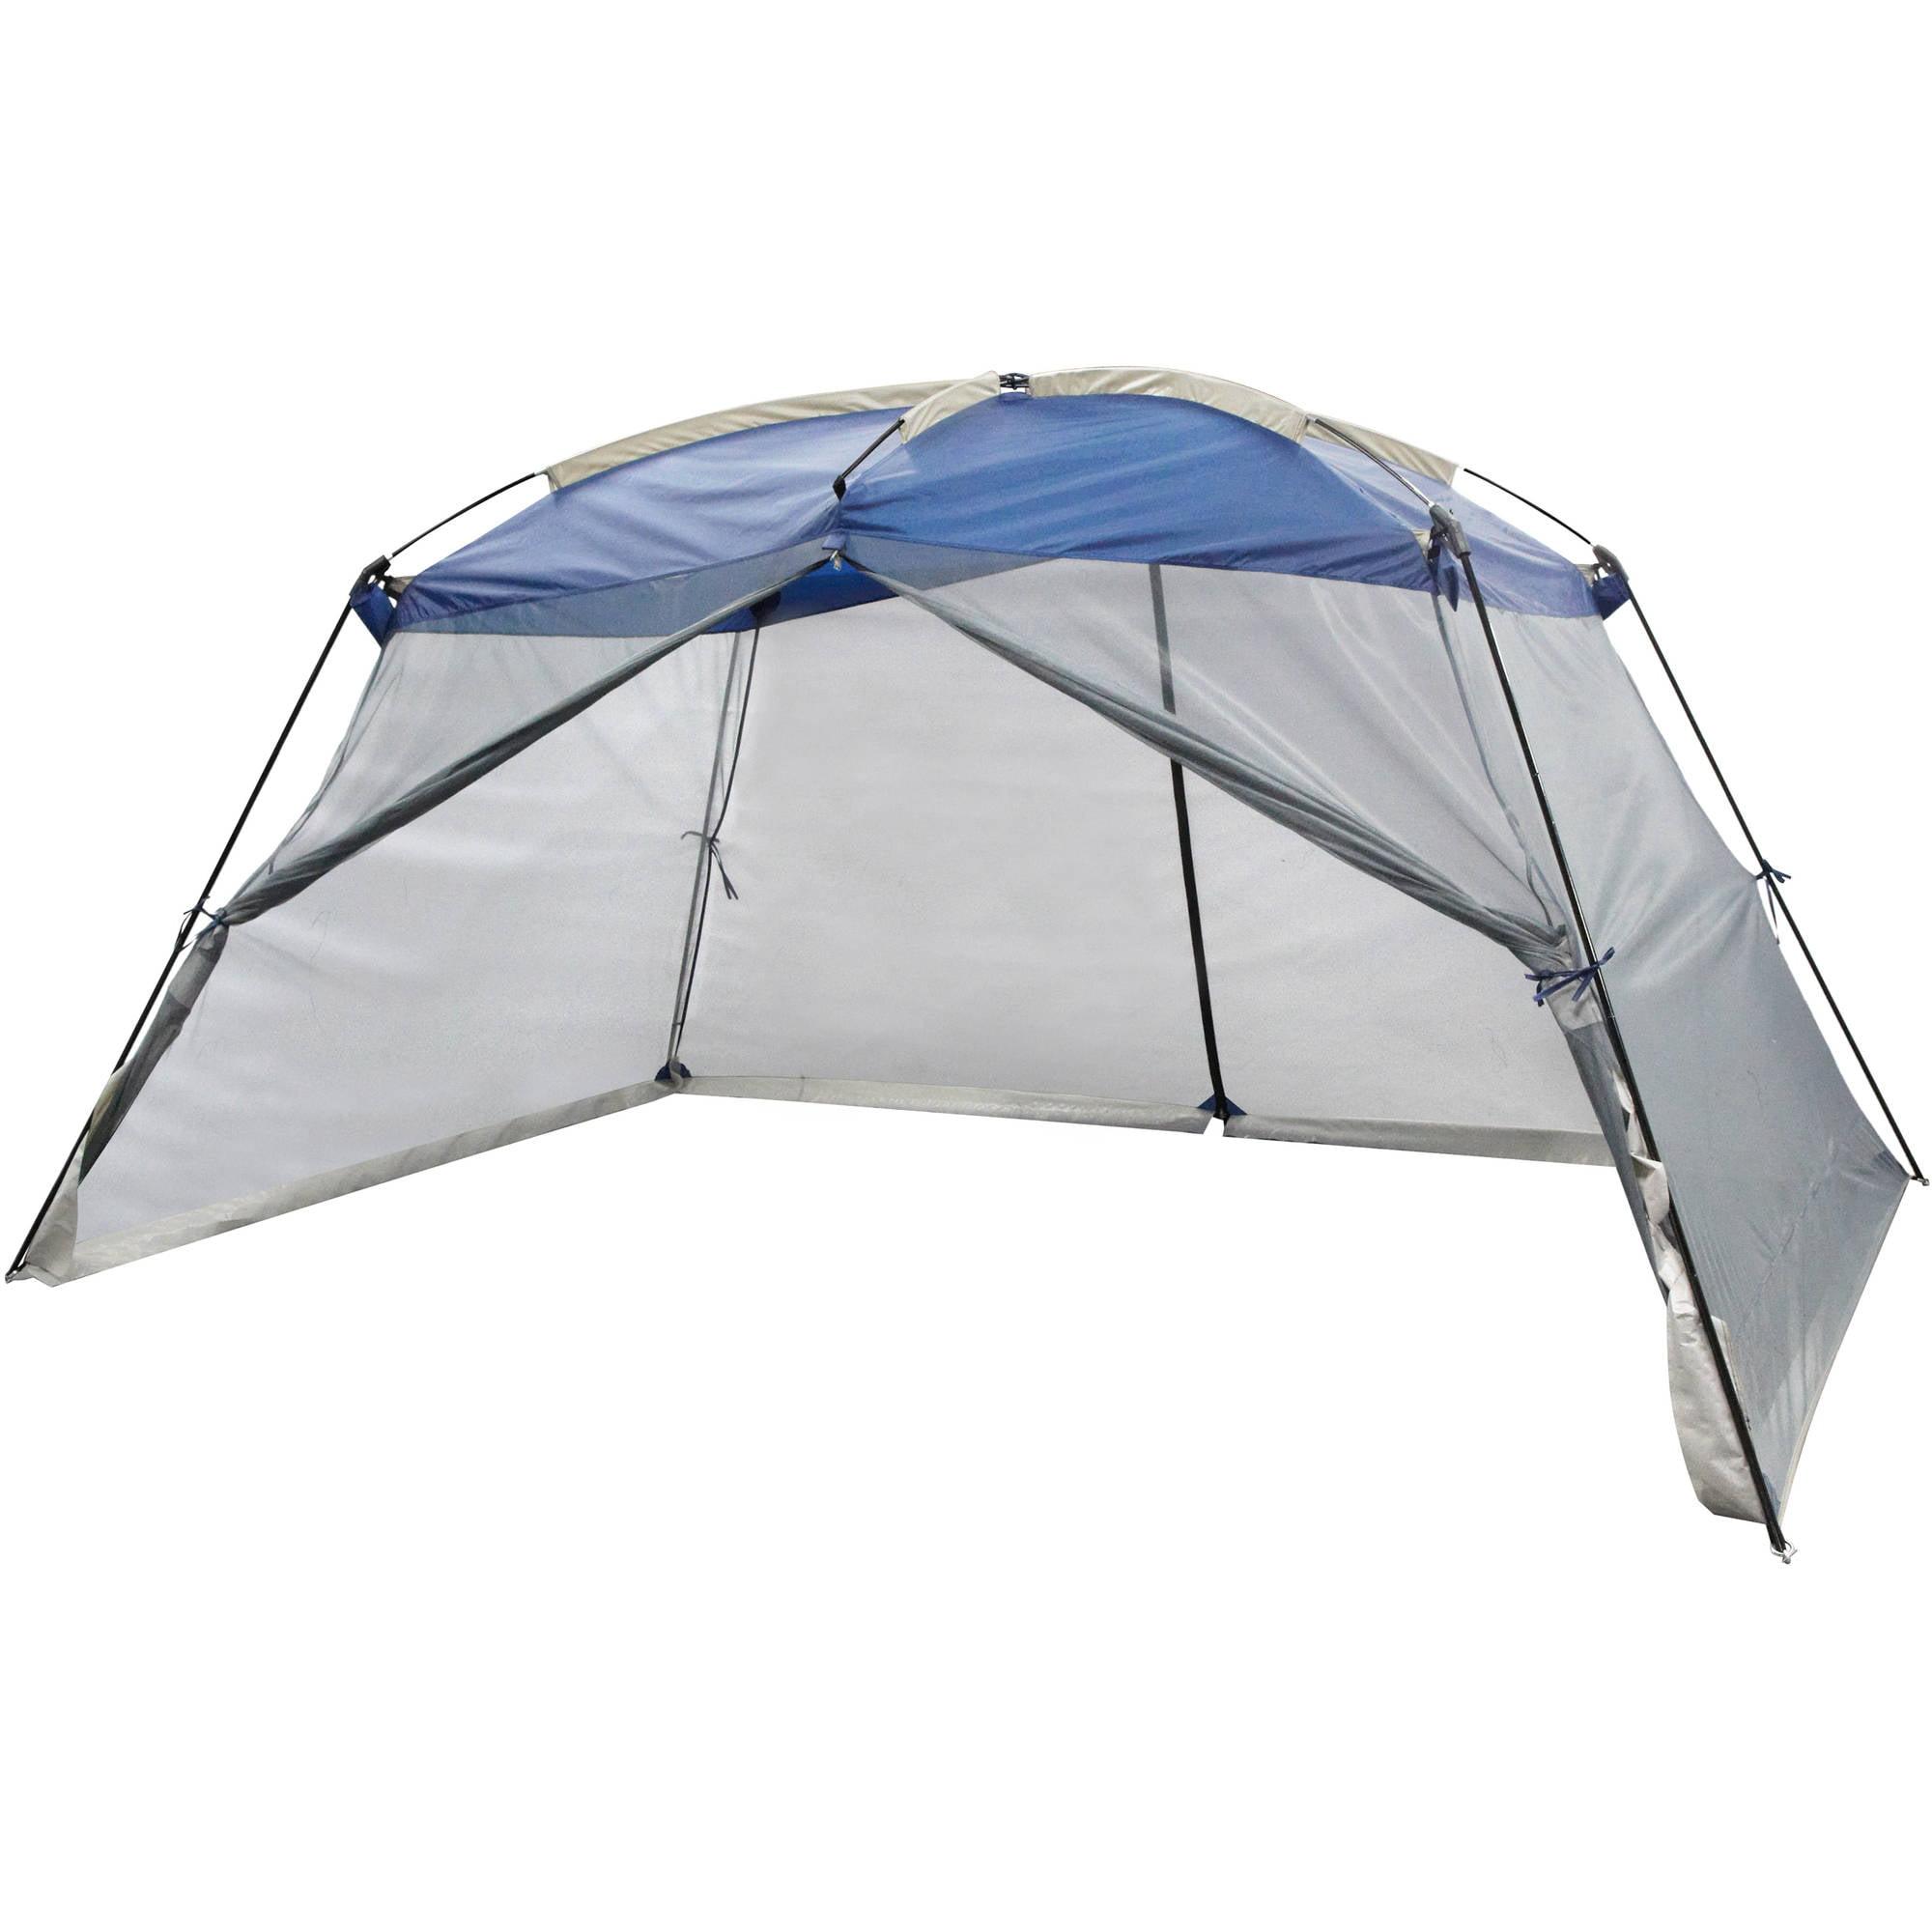 screen house awnings canopies u0026 tents ebay